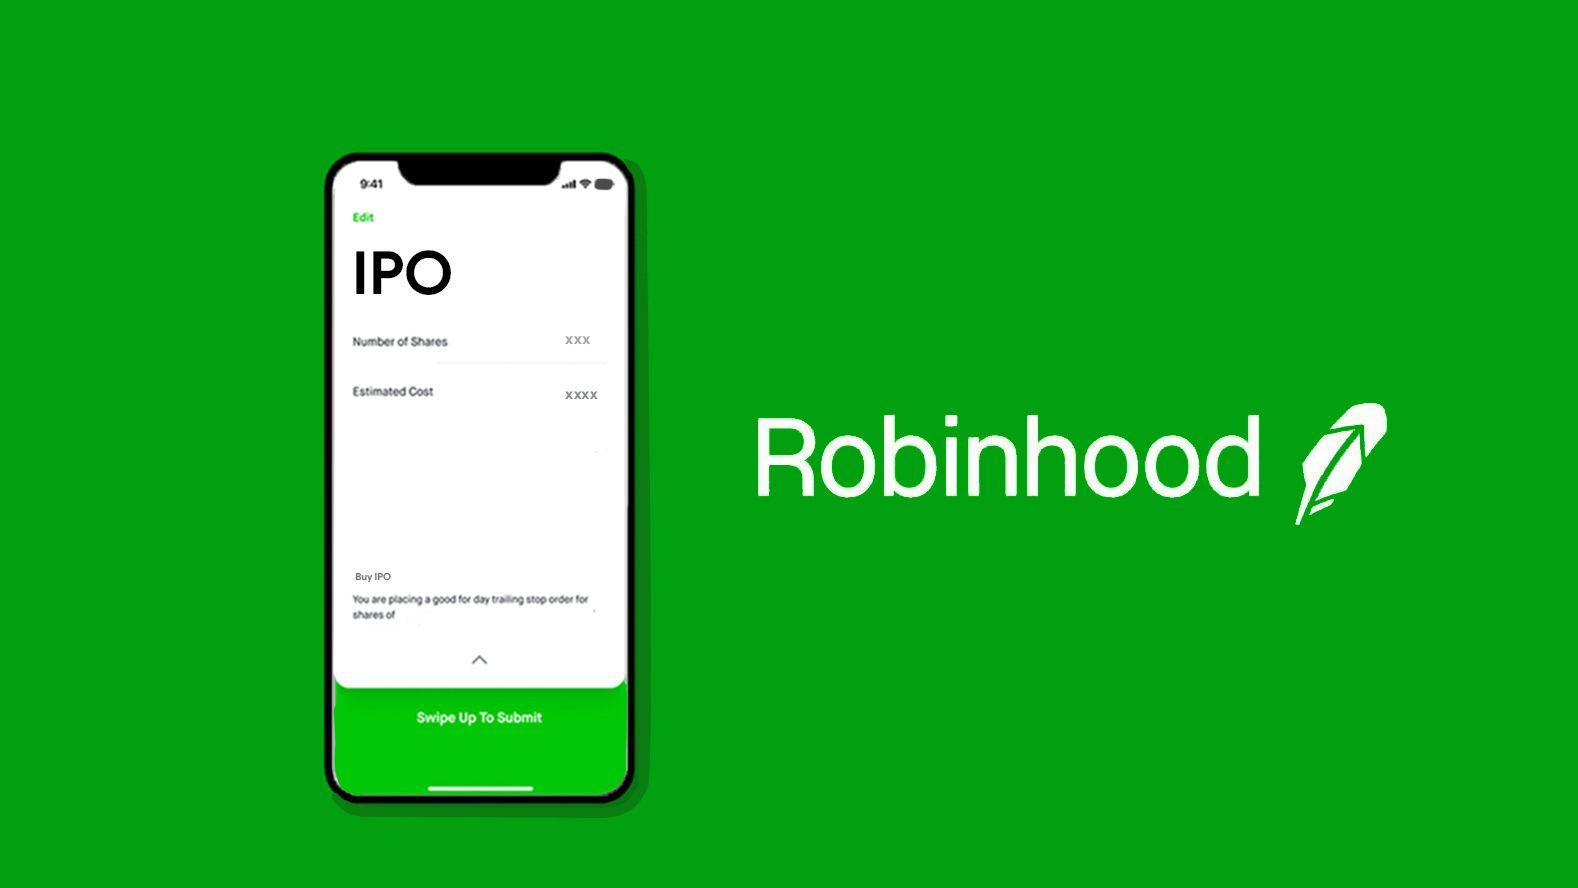 A look at Robinhood's IPO